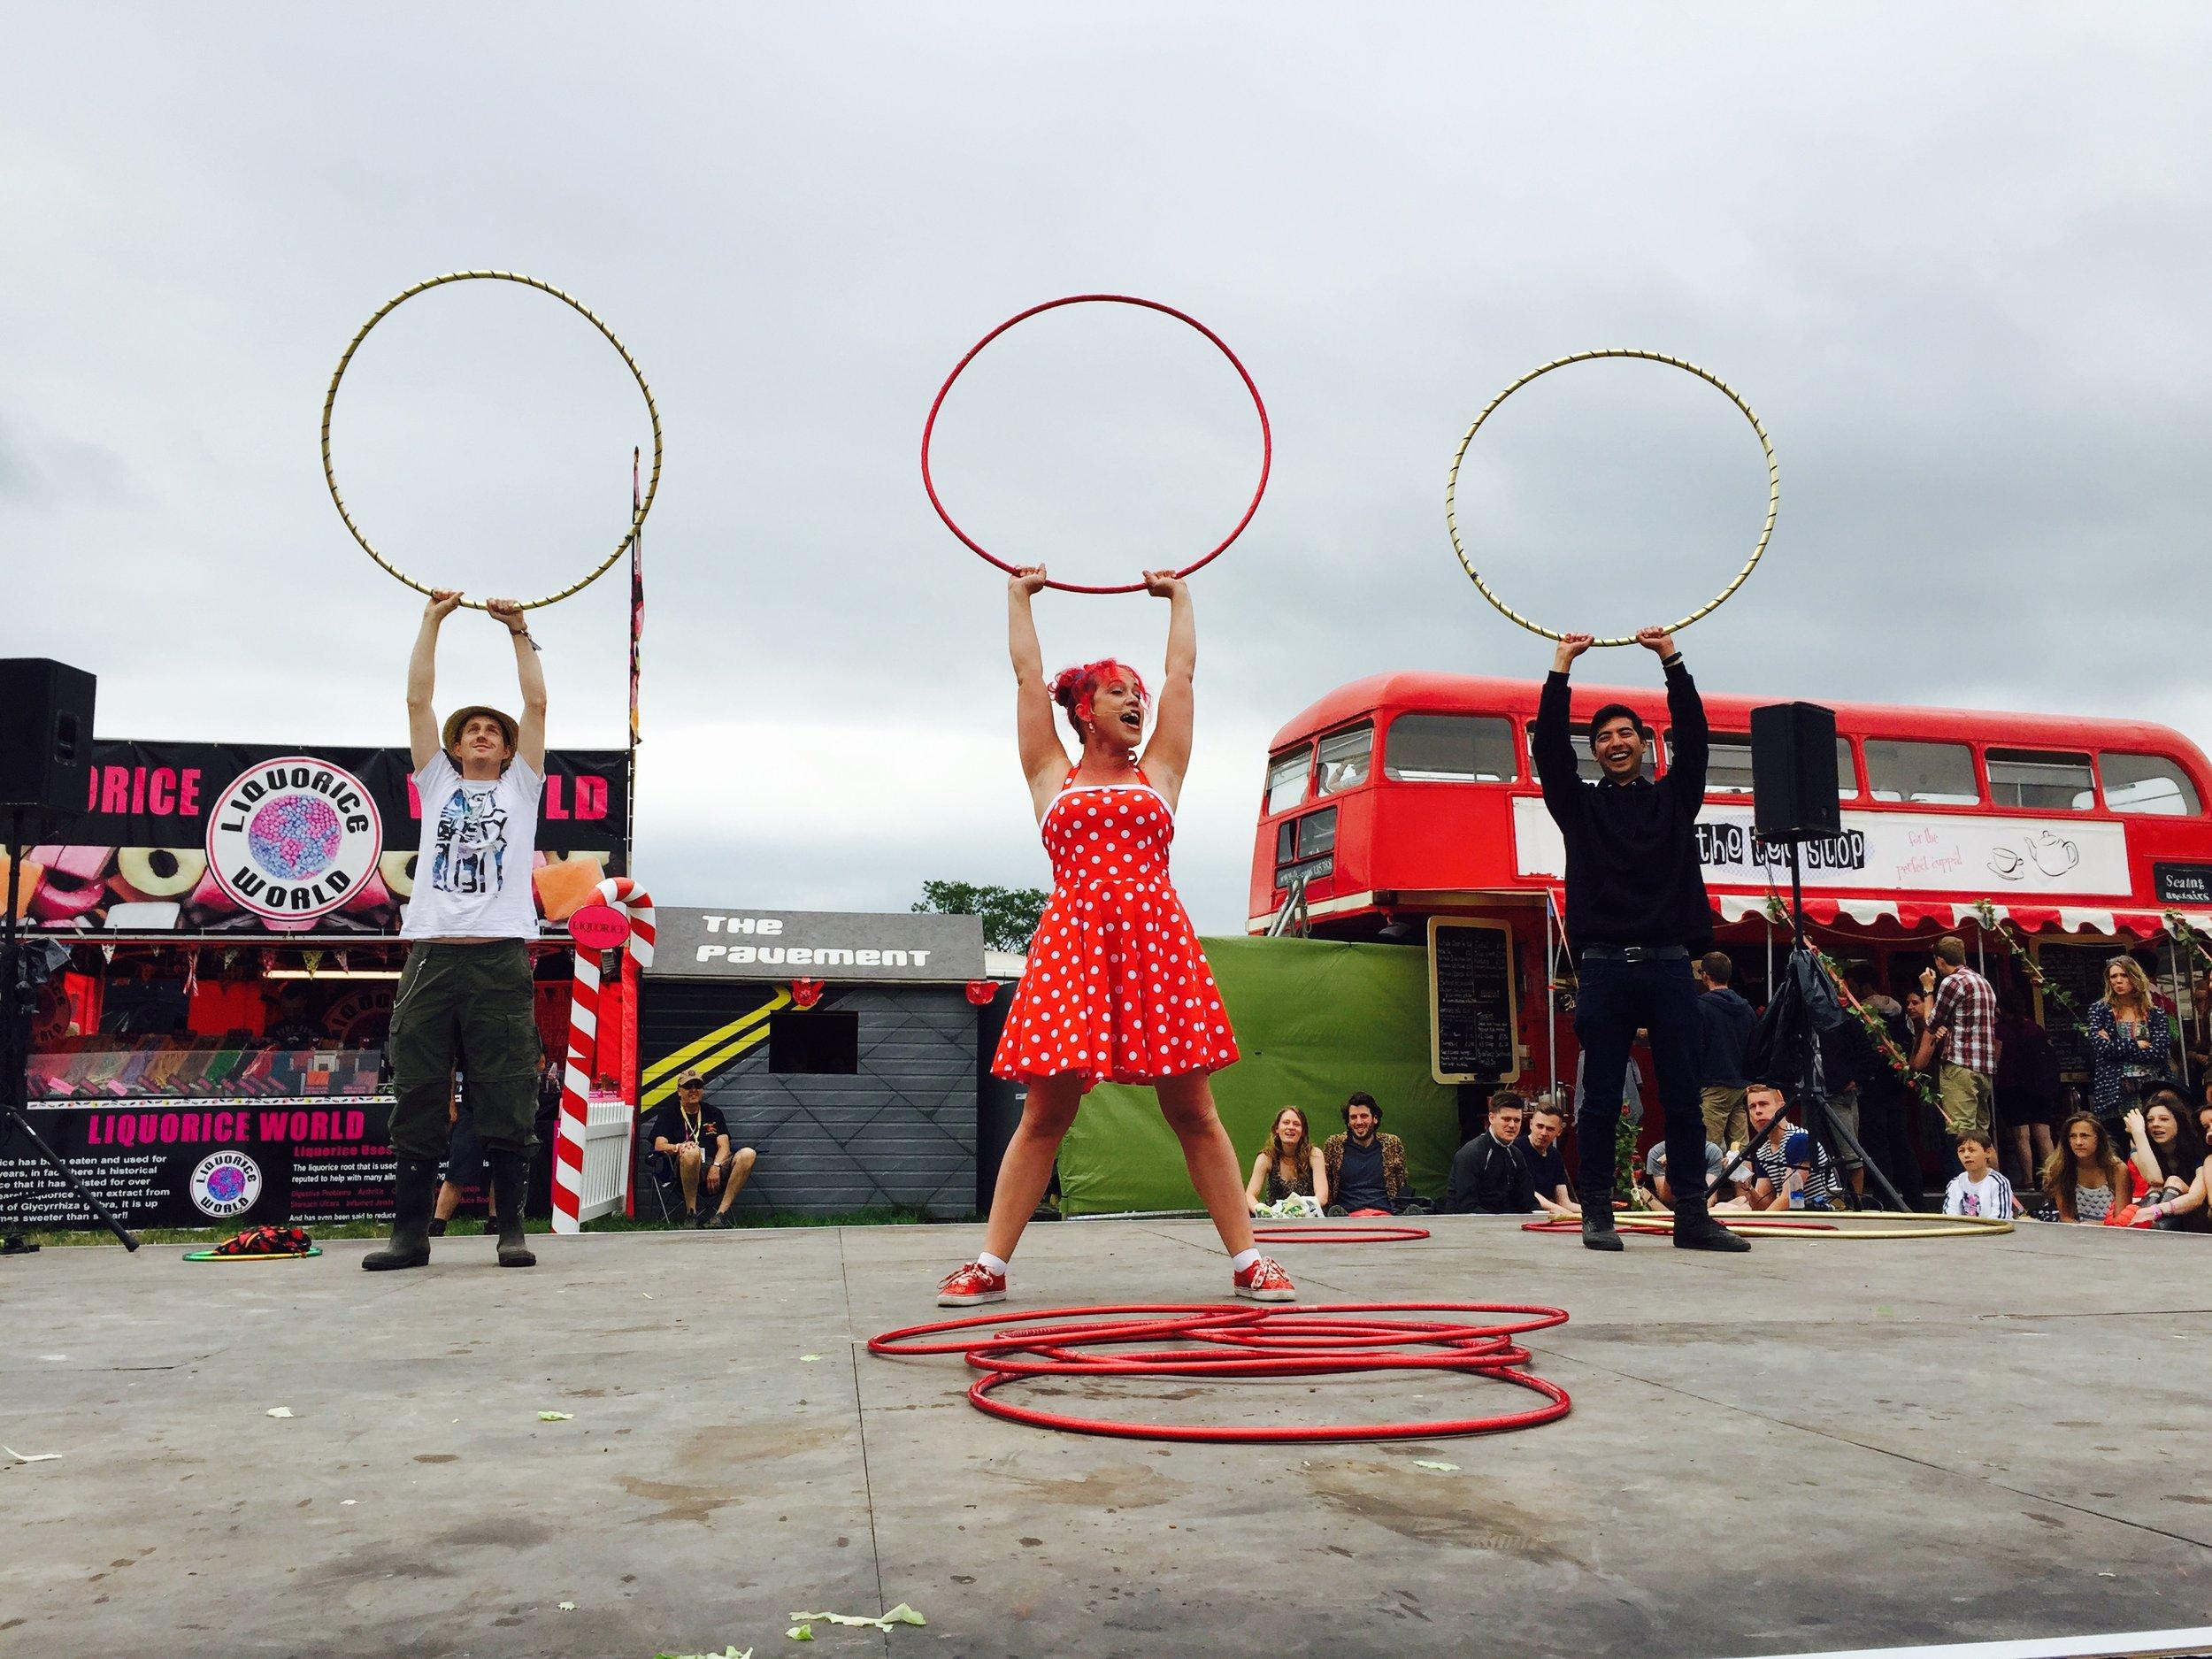 Angie Mack, Cirque Bijou, Circus Playground.jpg